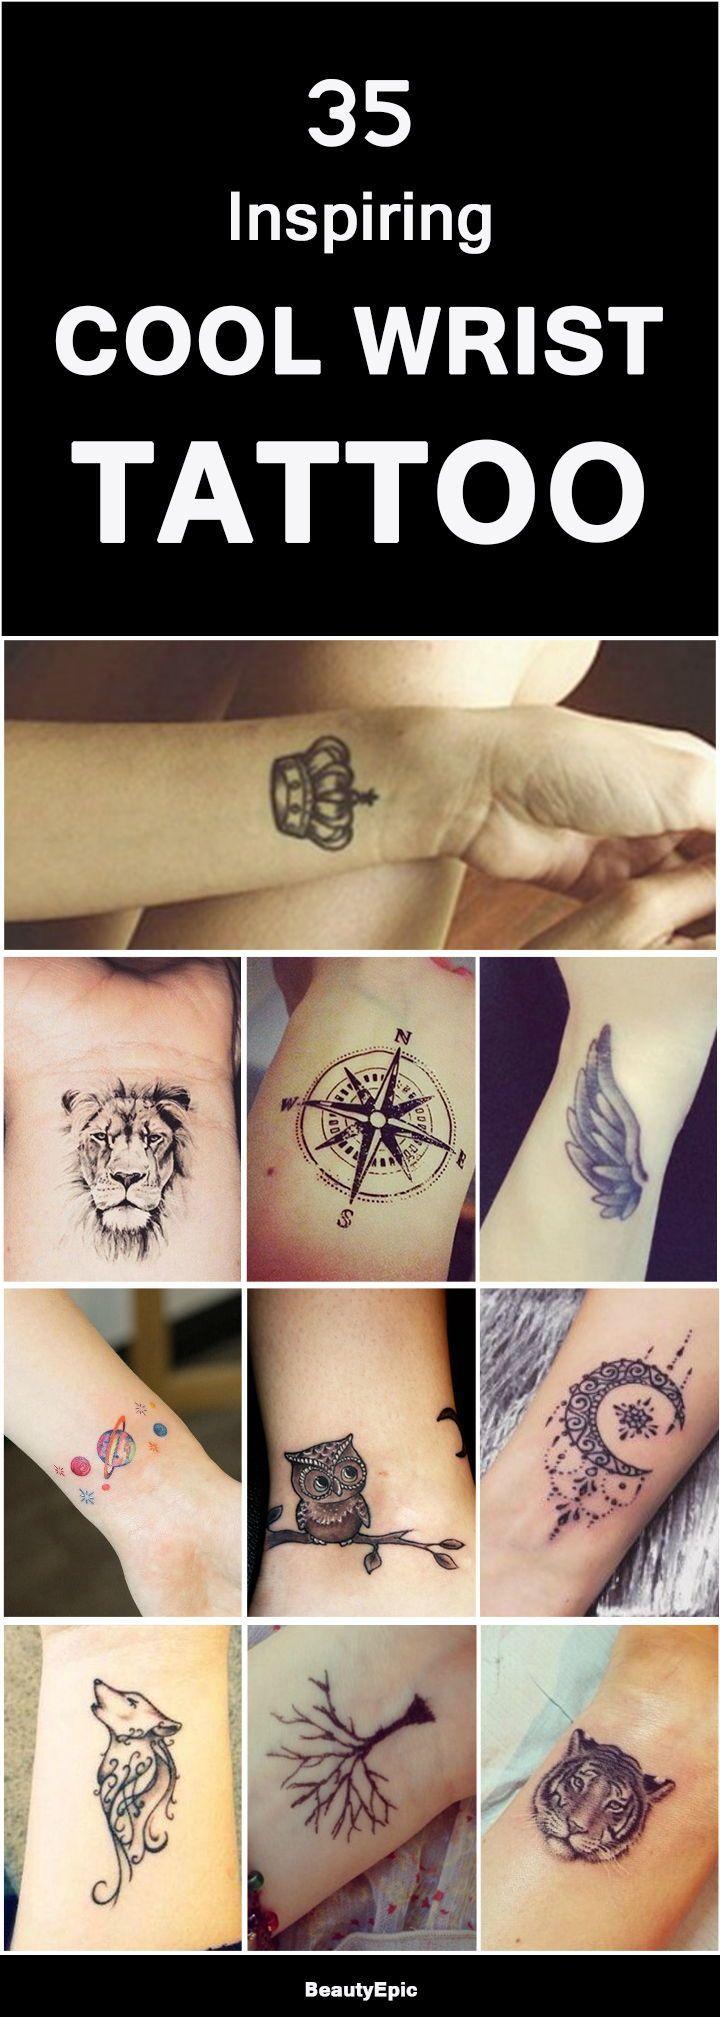 35 Inspiring Cool Wrist Tattoos For Men Women To Get Now Cool Wrist Tattoos Tattoos For Guys Wrist Tattoos For Guys